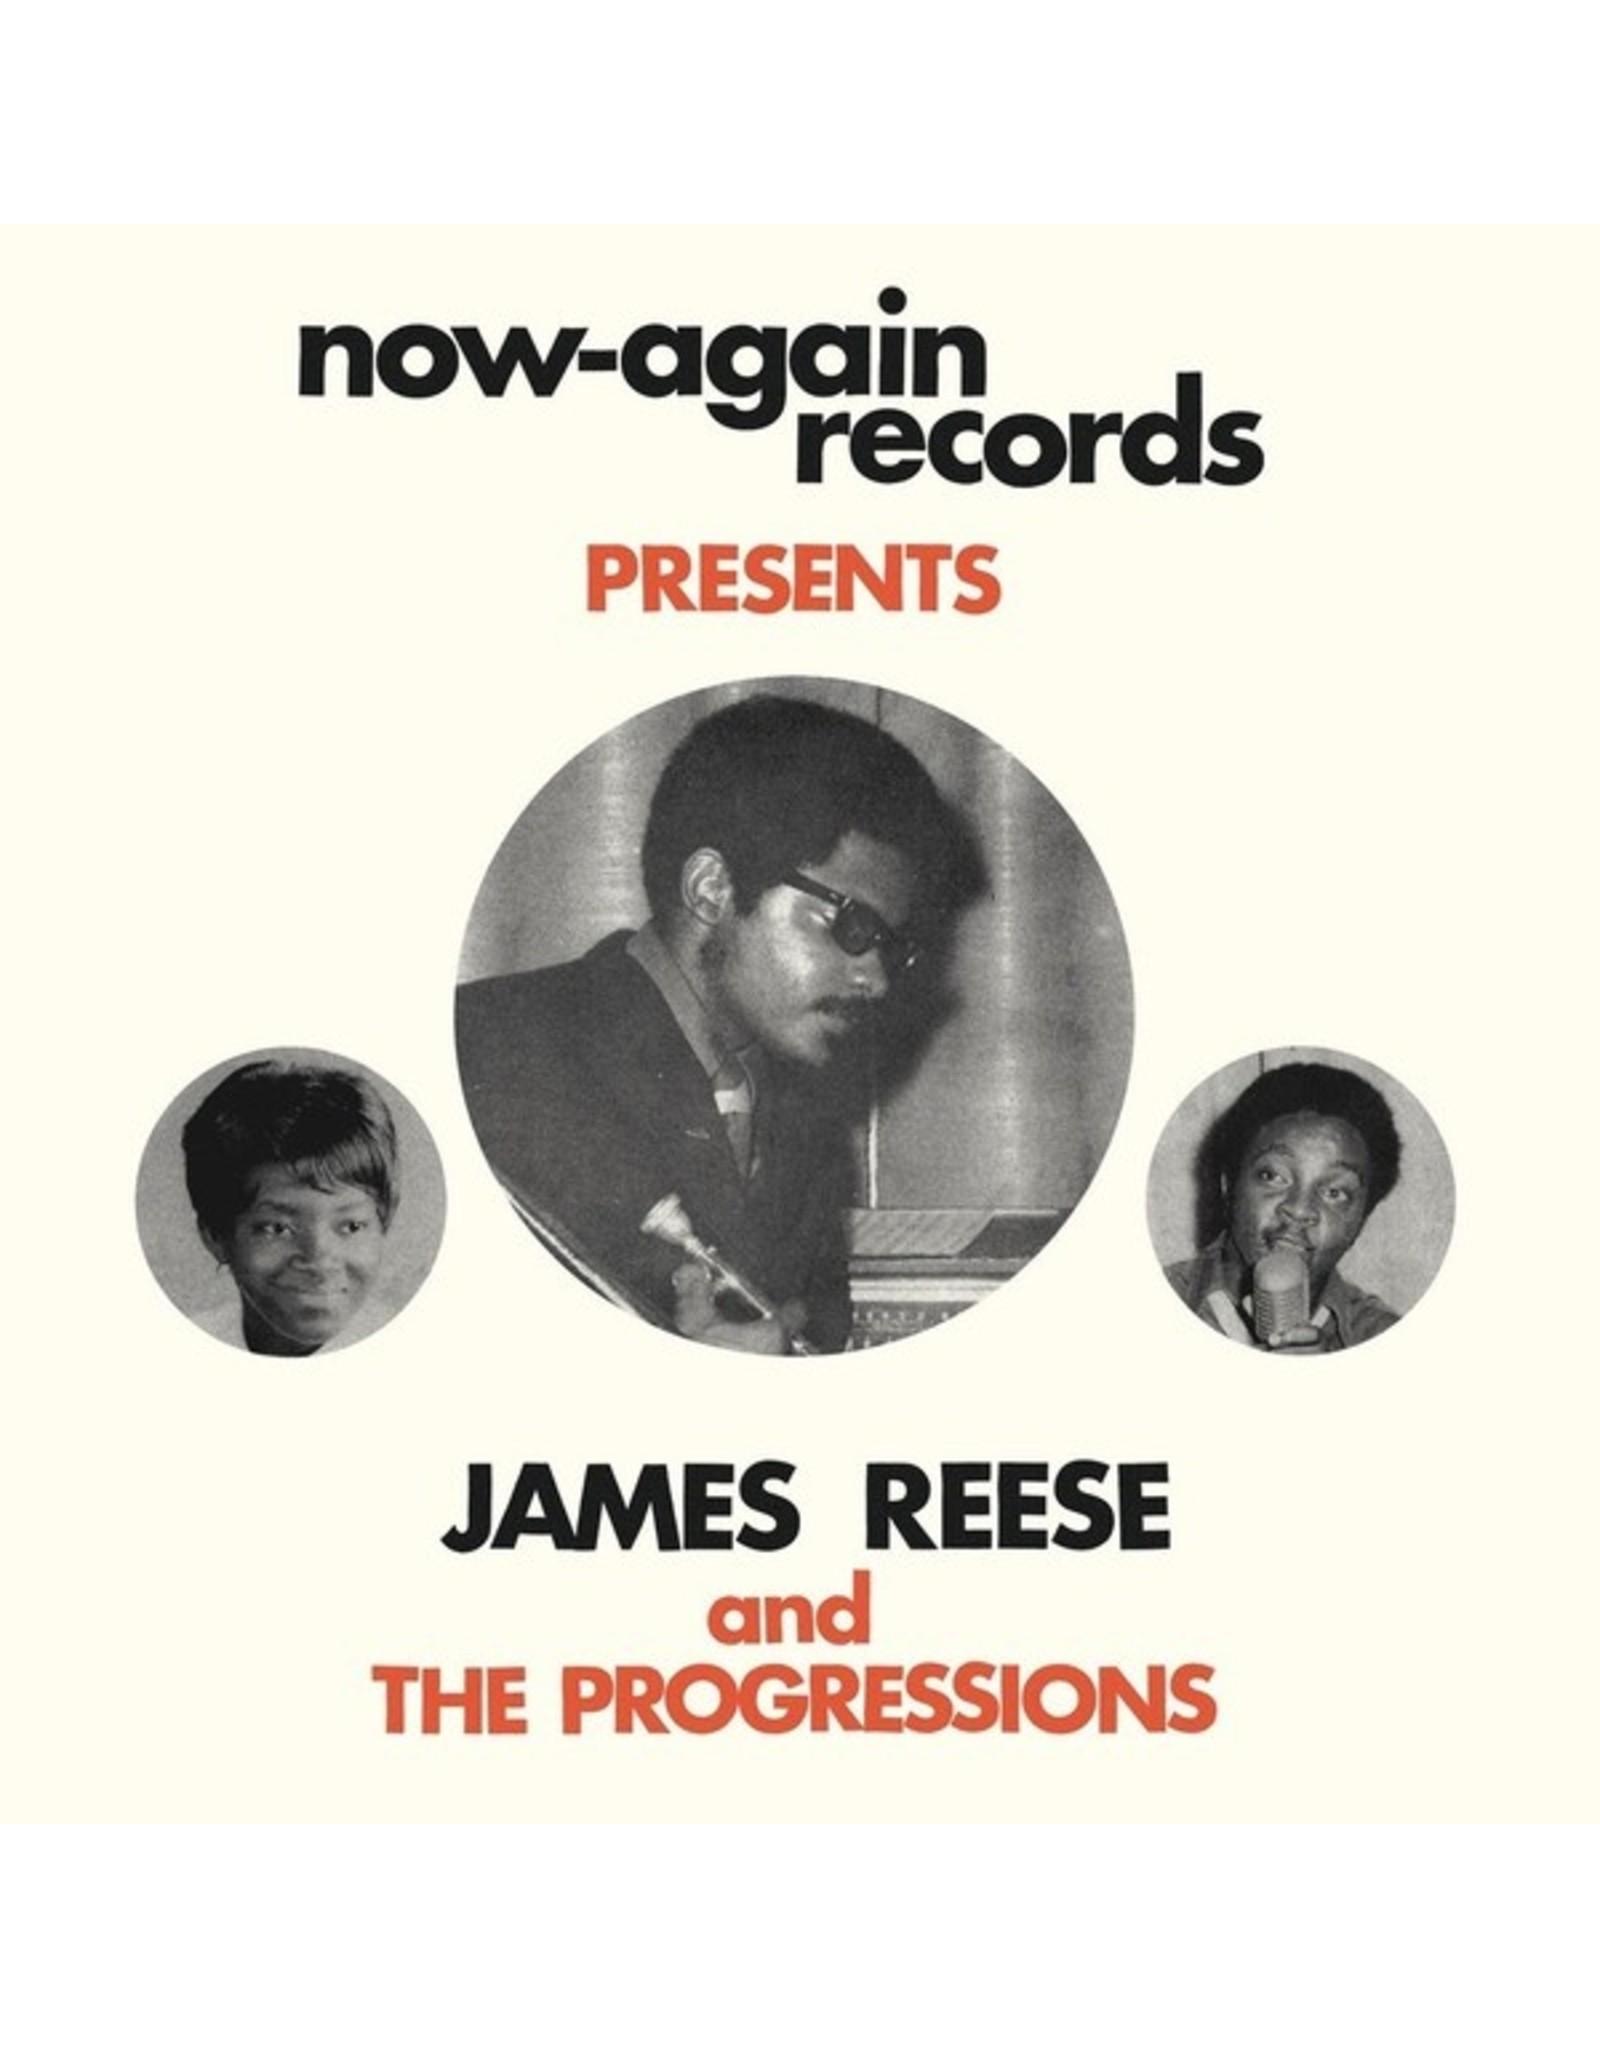 James Reese & The Progressions - Wait For Me LP